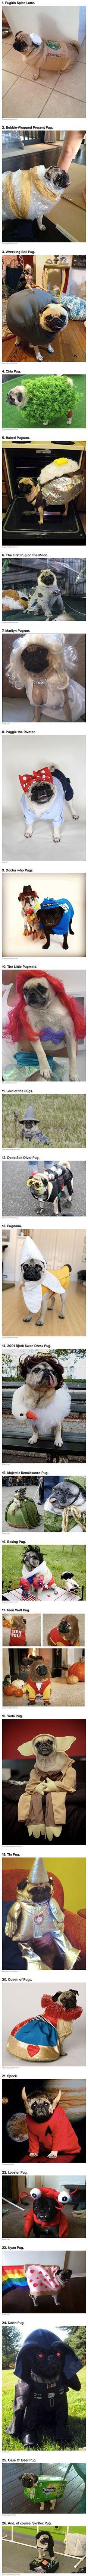 The ultimate Pug costumes. Bahahaha oh my gosh